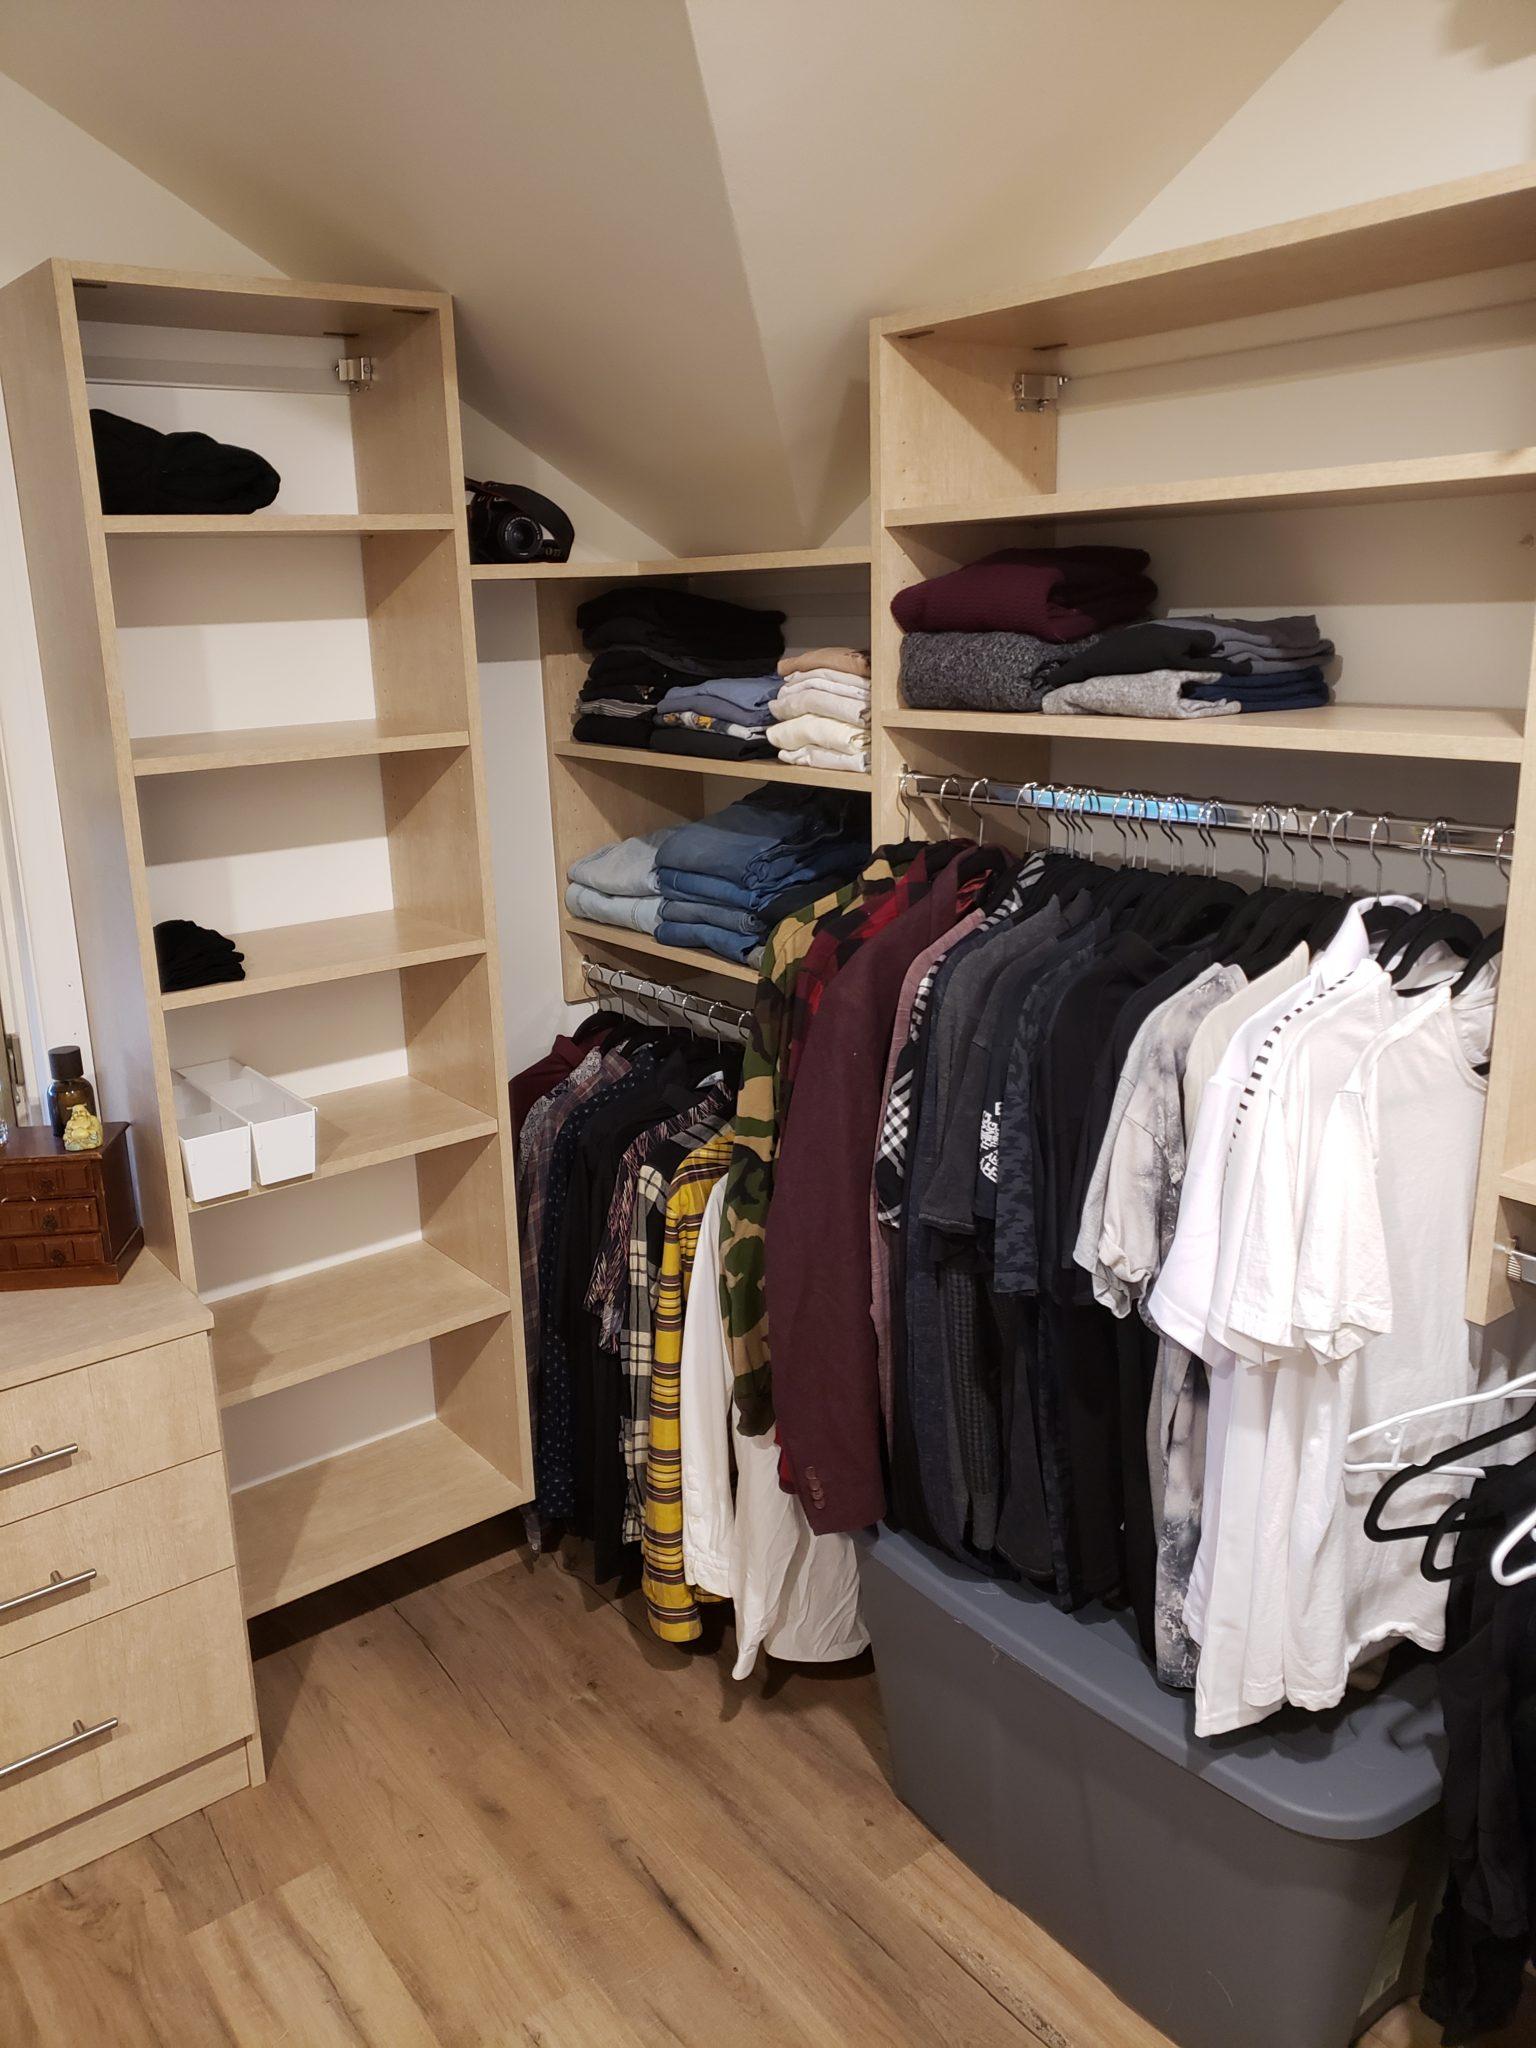 Home closet - After